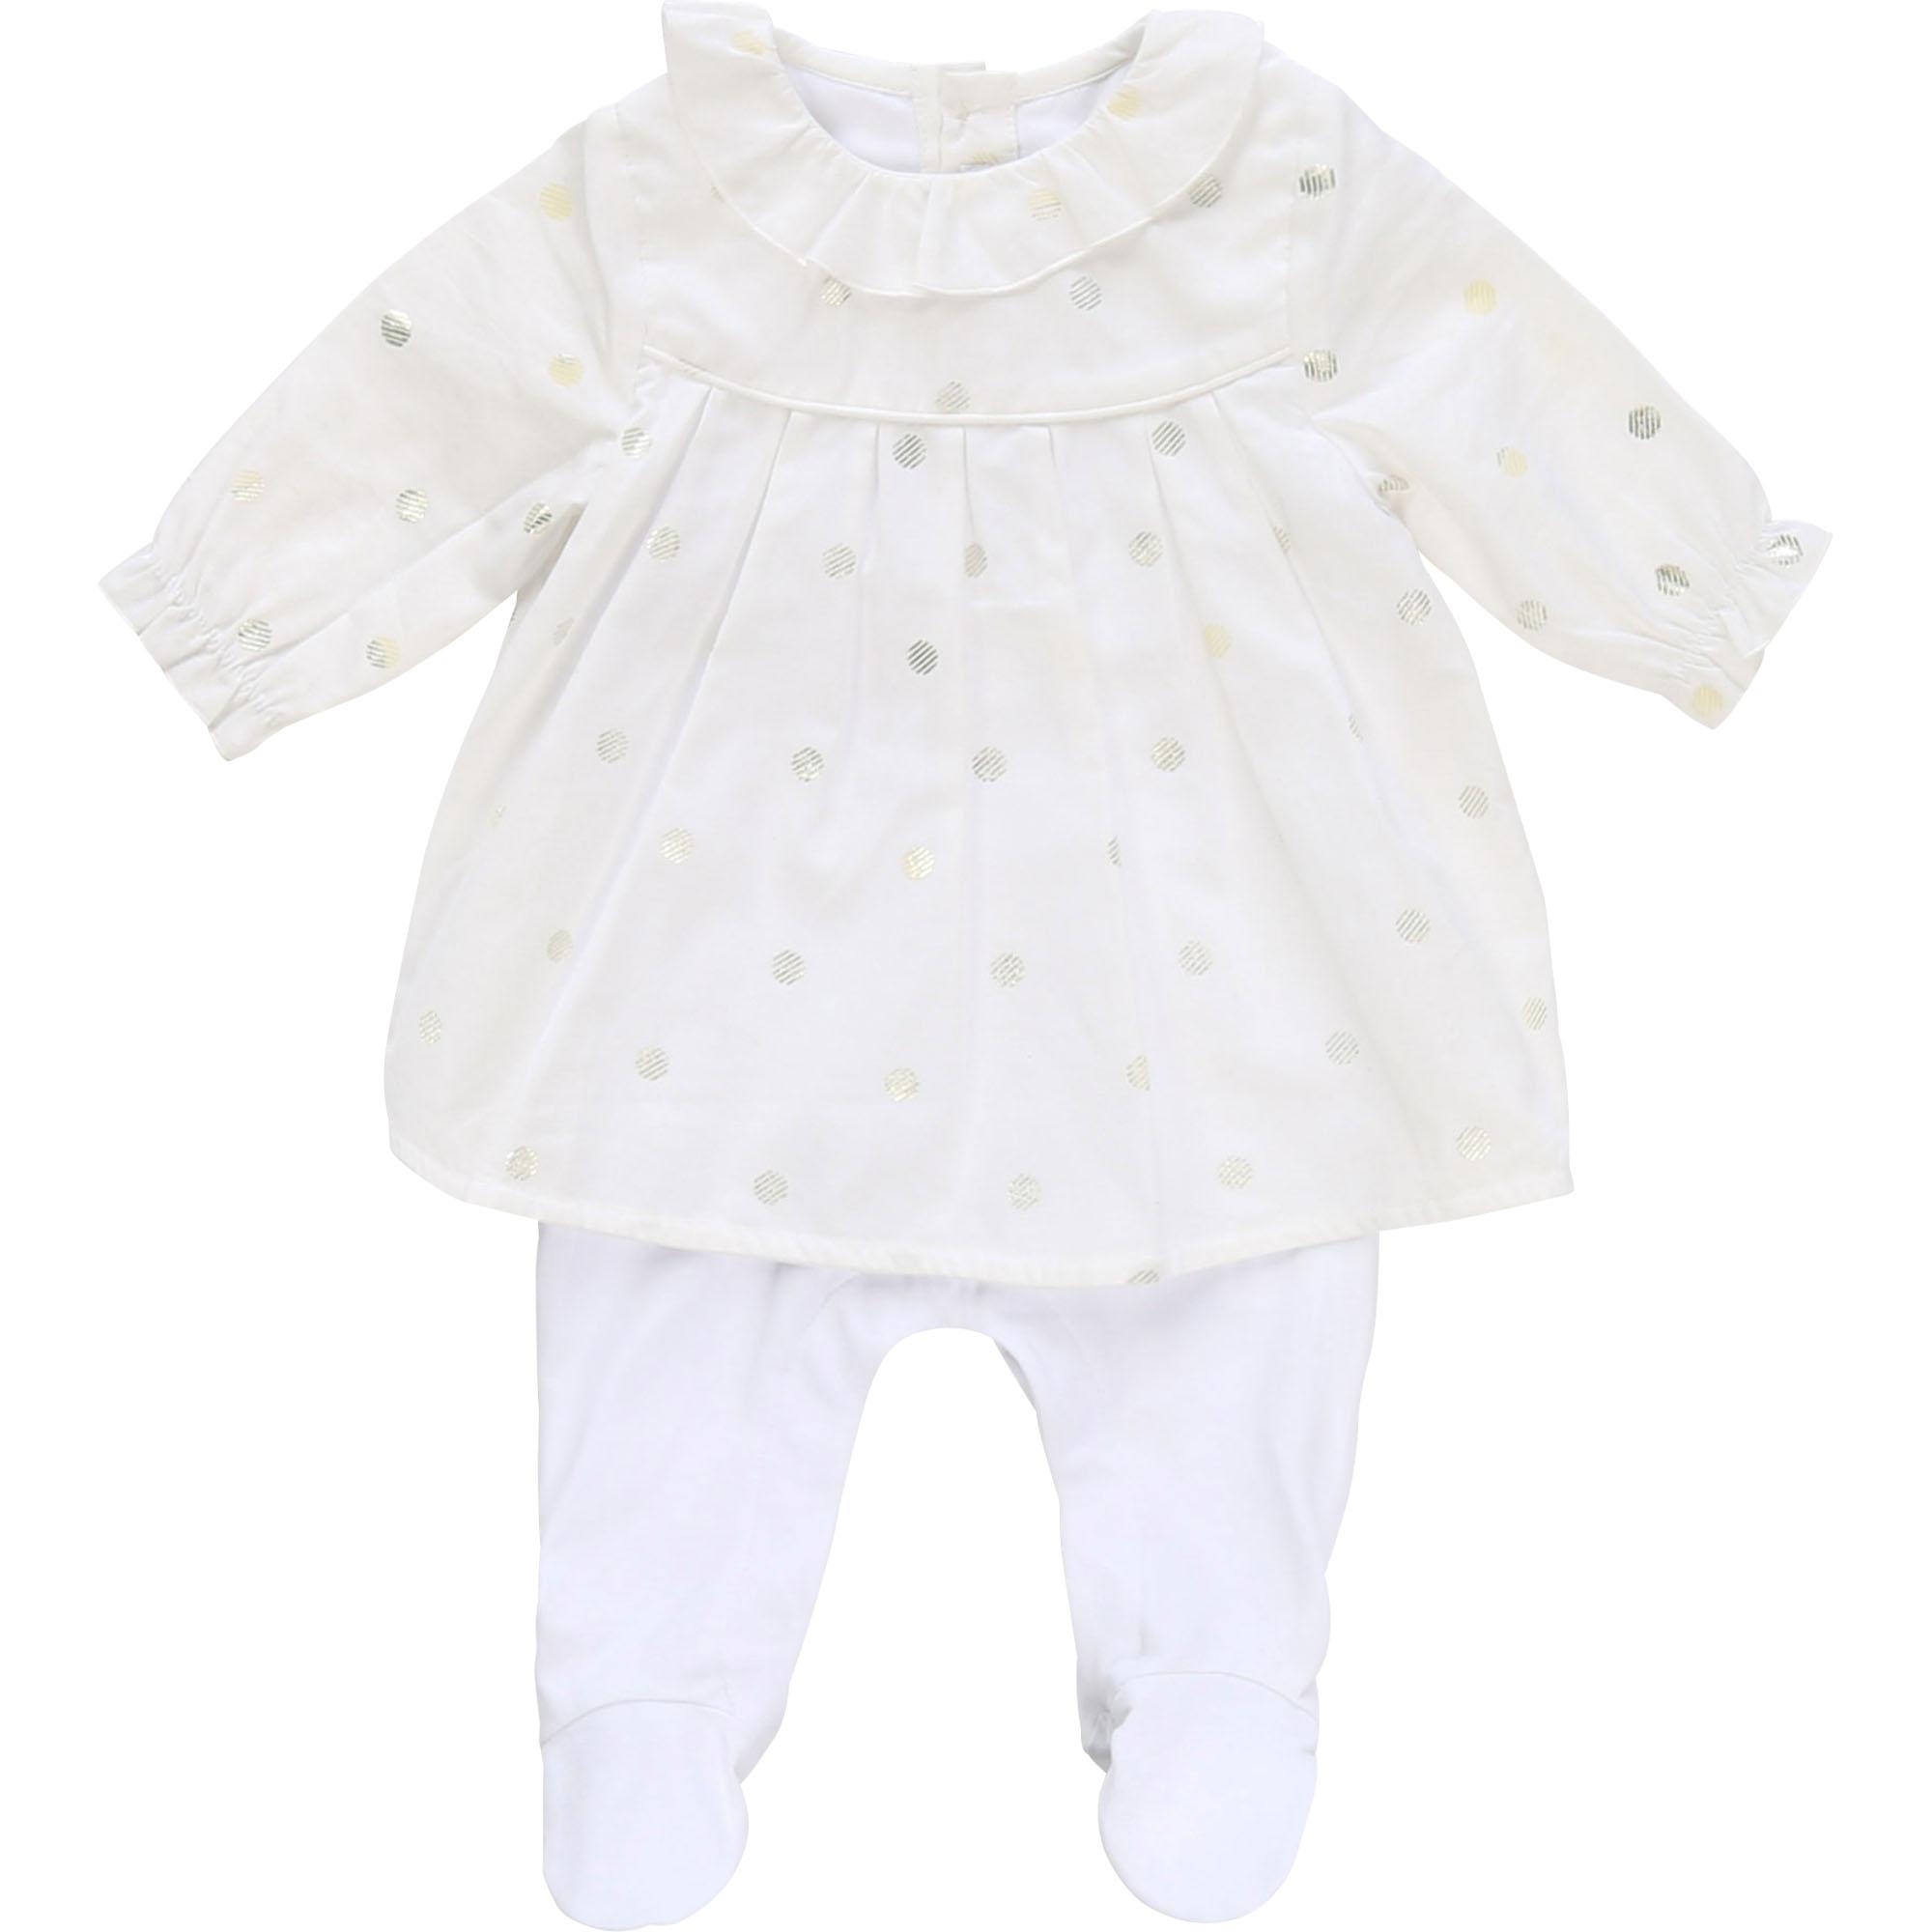 Pyjama 2 en 1 bimatière BOSS BEBE COUCHE FILLE Blanc